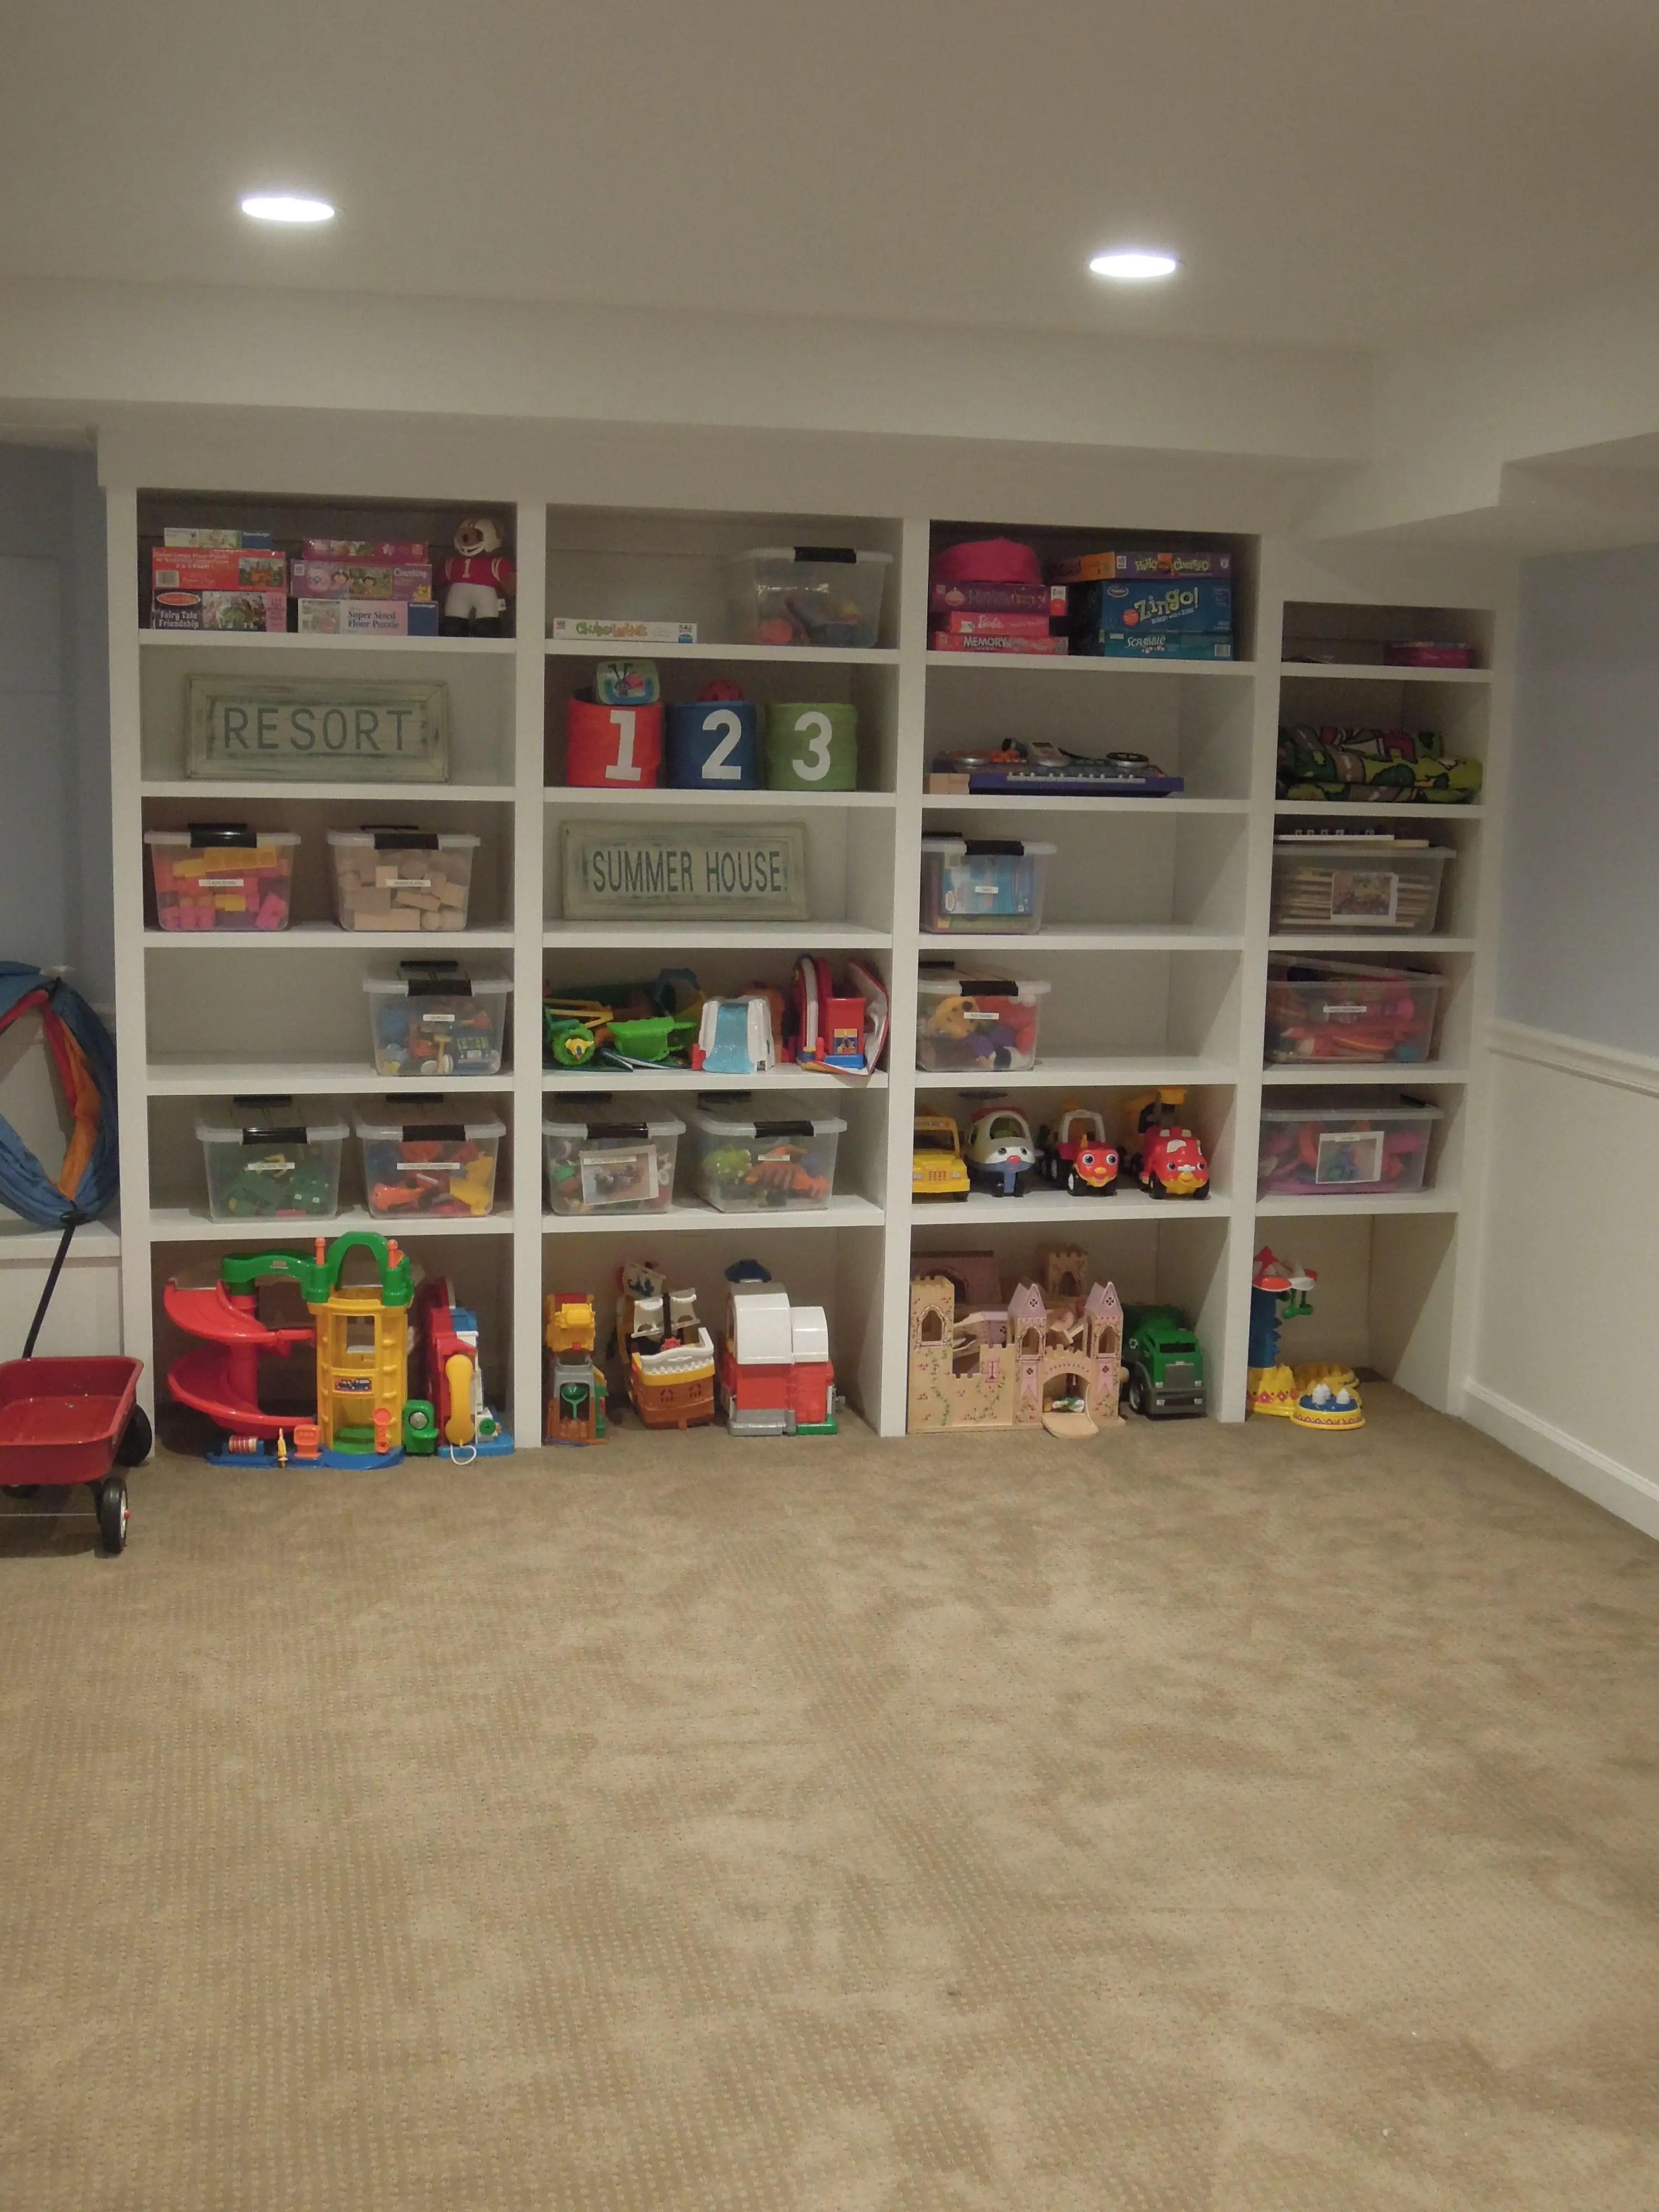 Basement Playroom Ideas 10